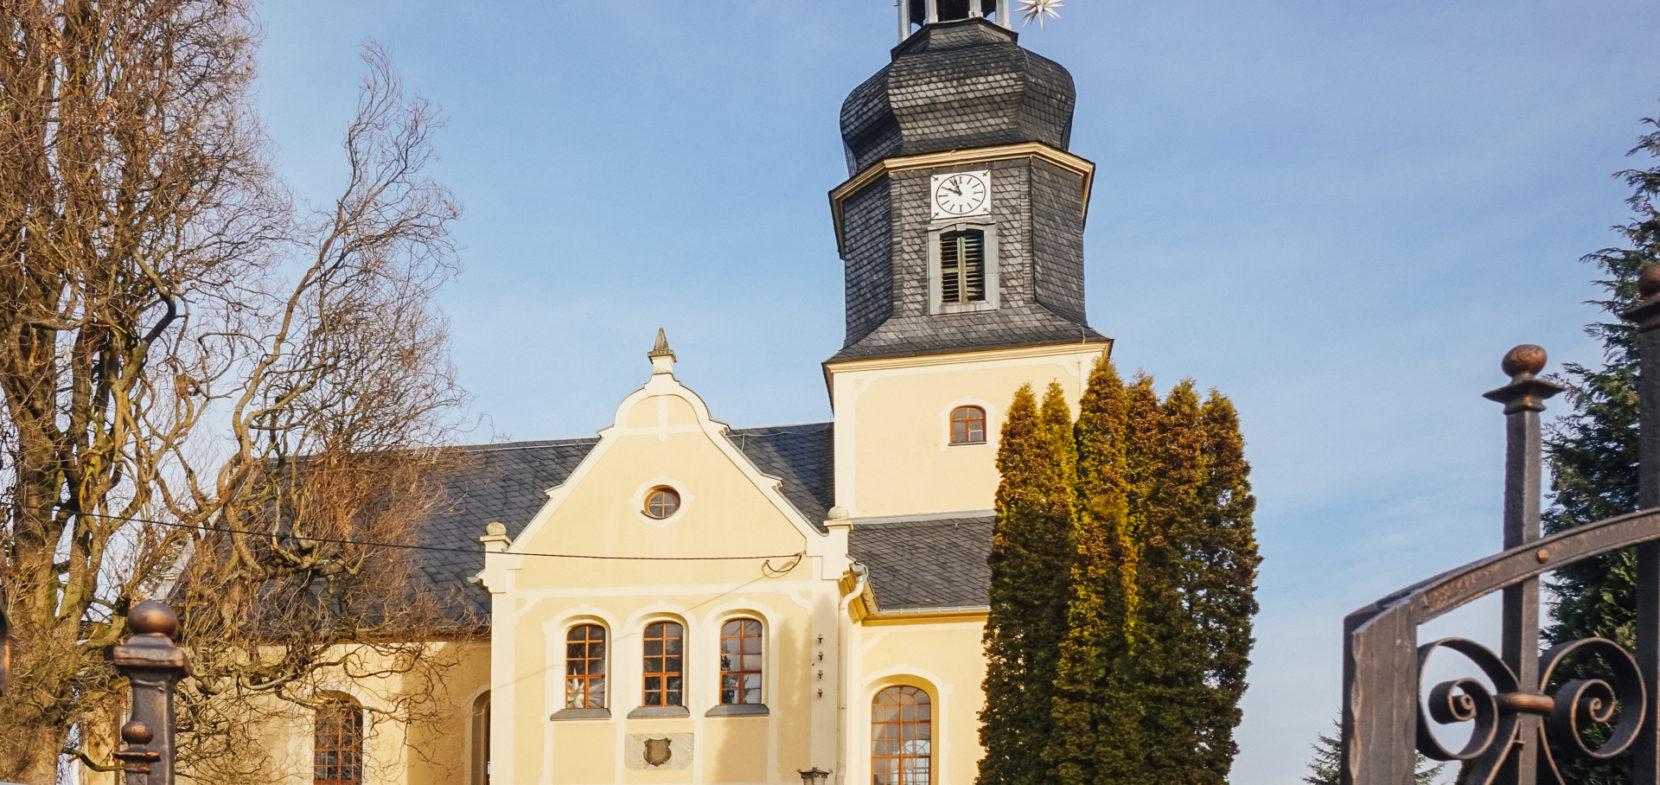 Kirche St. Michael in Mülsen St. Micheln